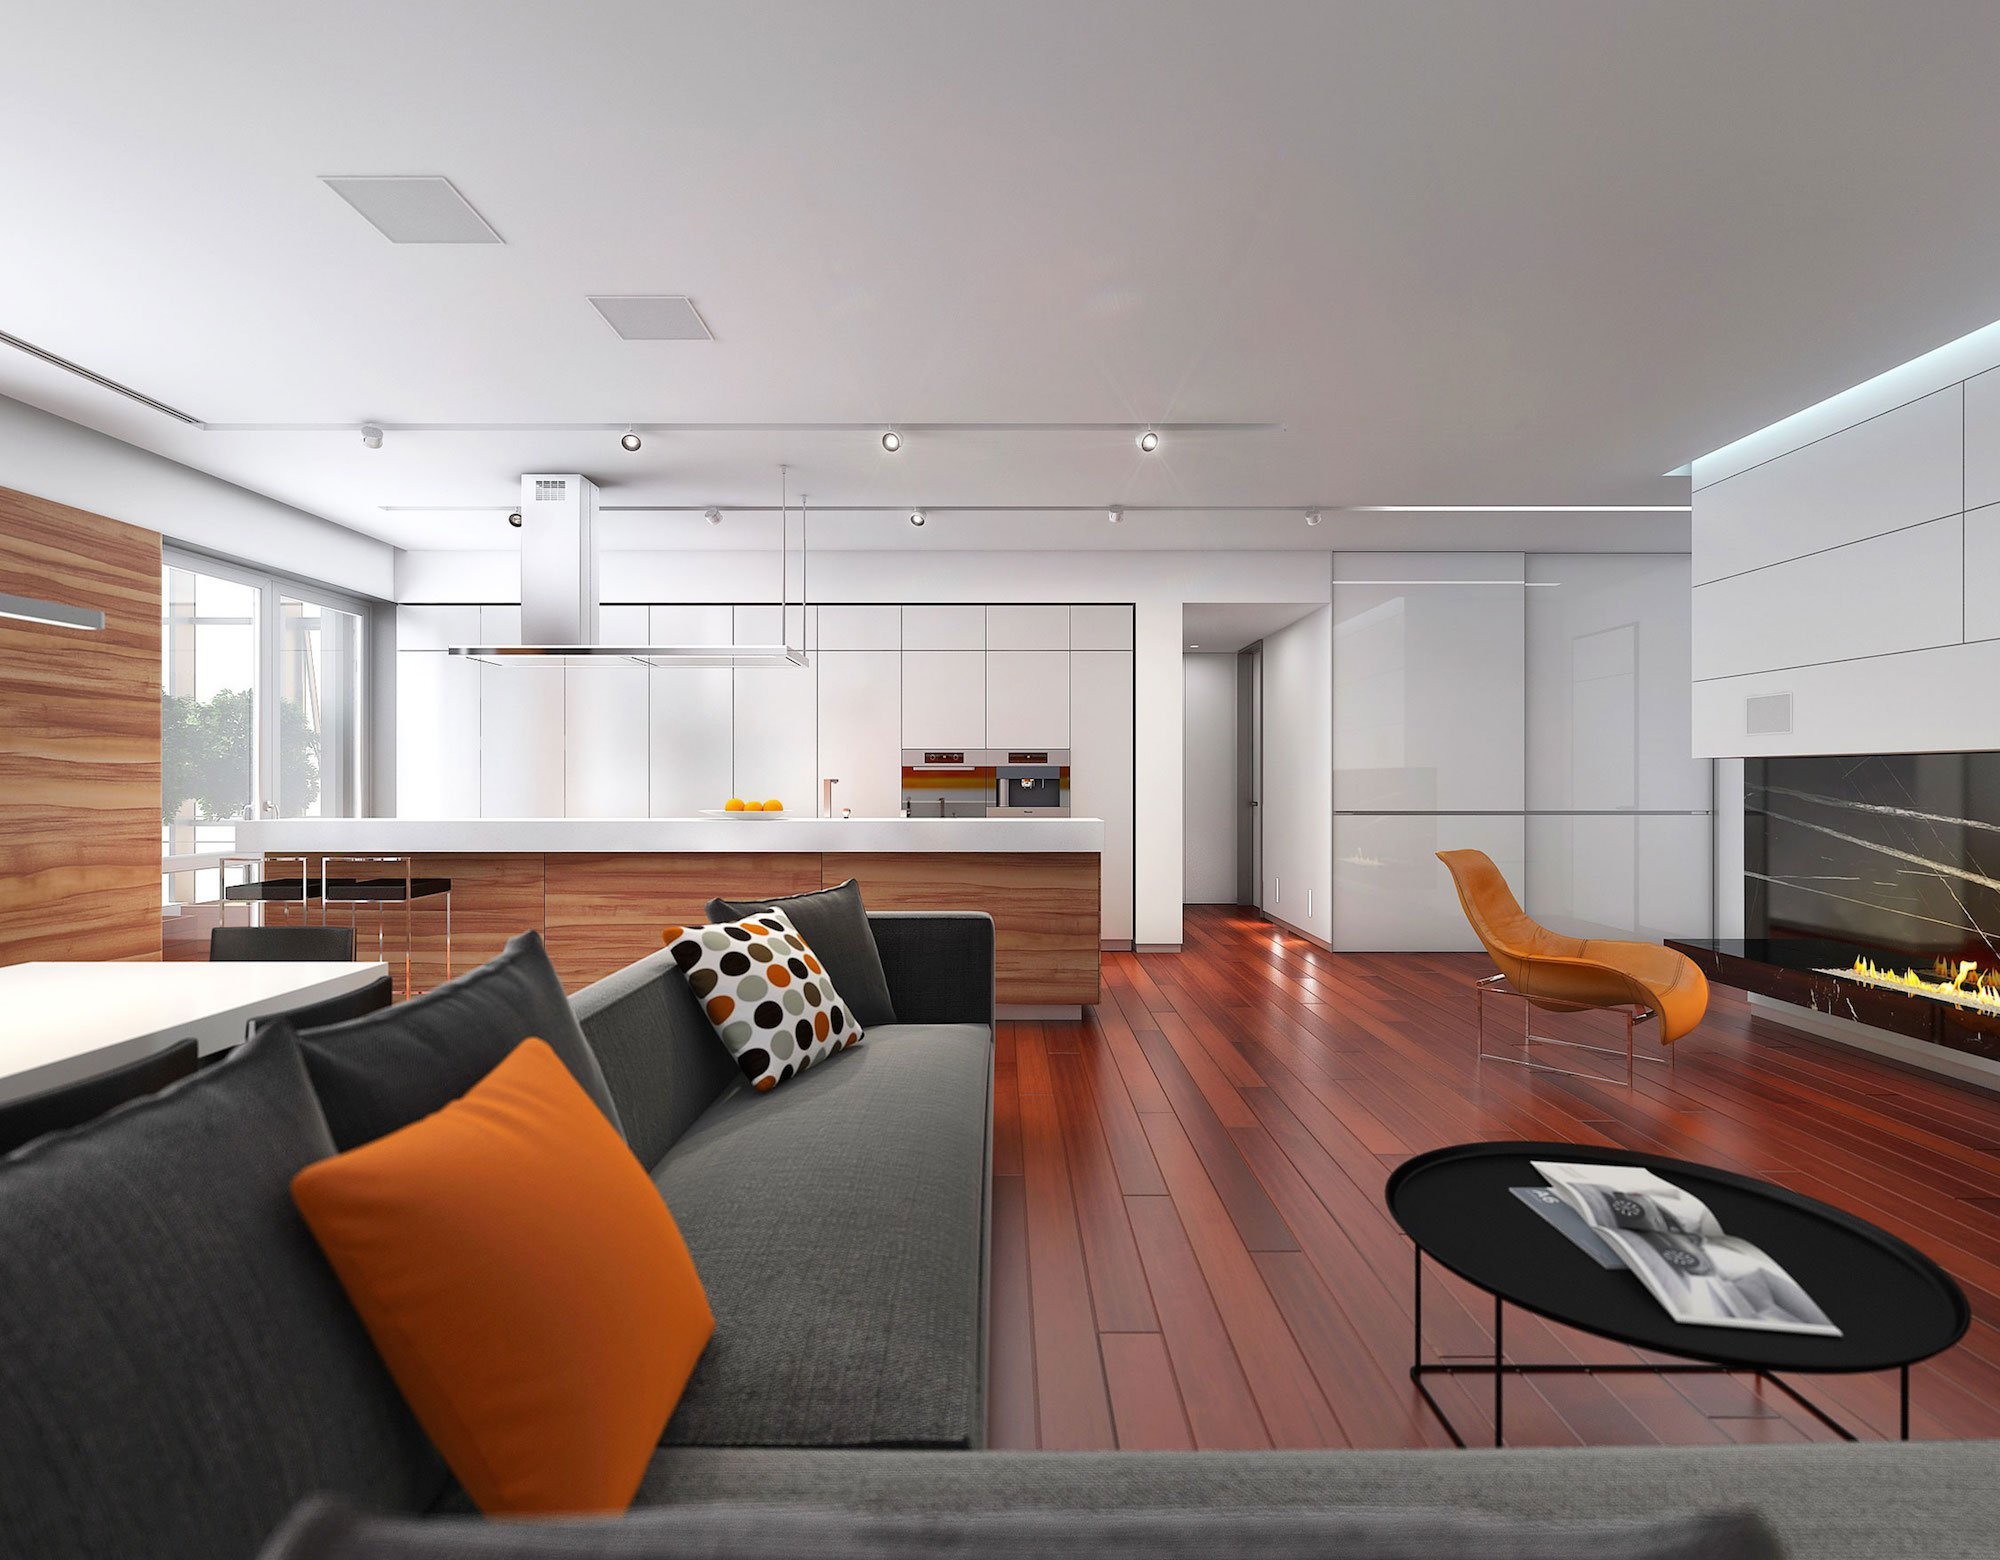 Dise o de sala y cocina comedor construye hogar for Diseno sala comedor cocina